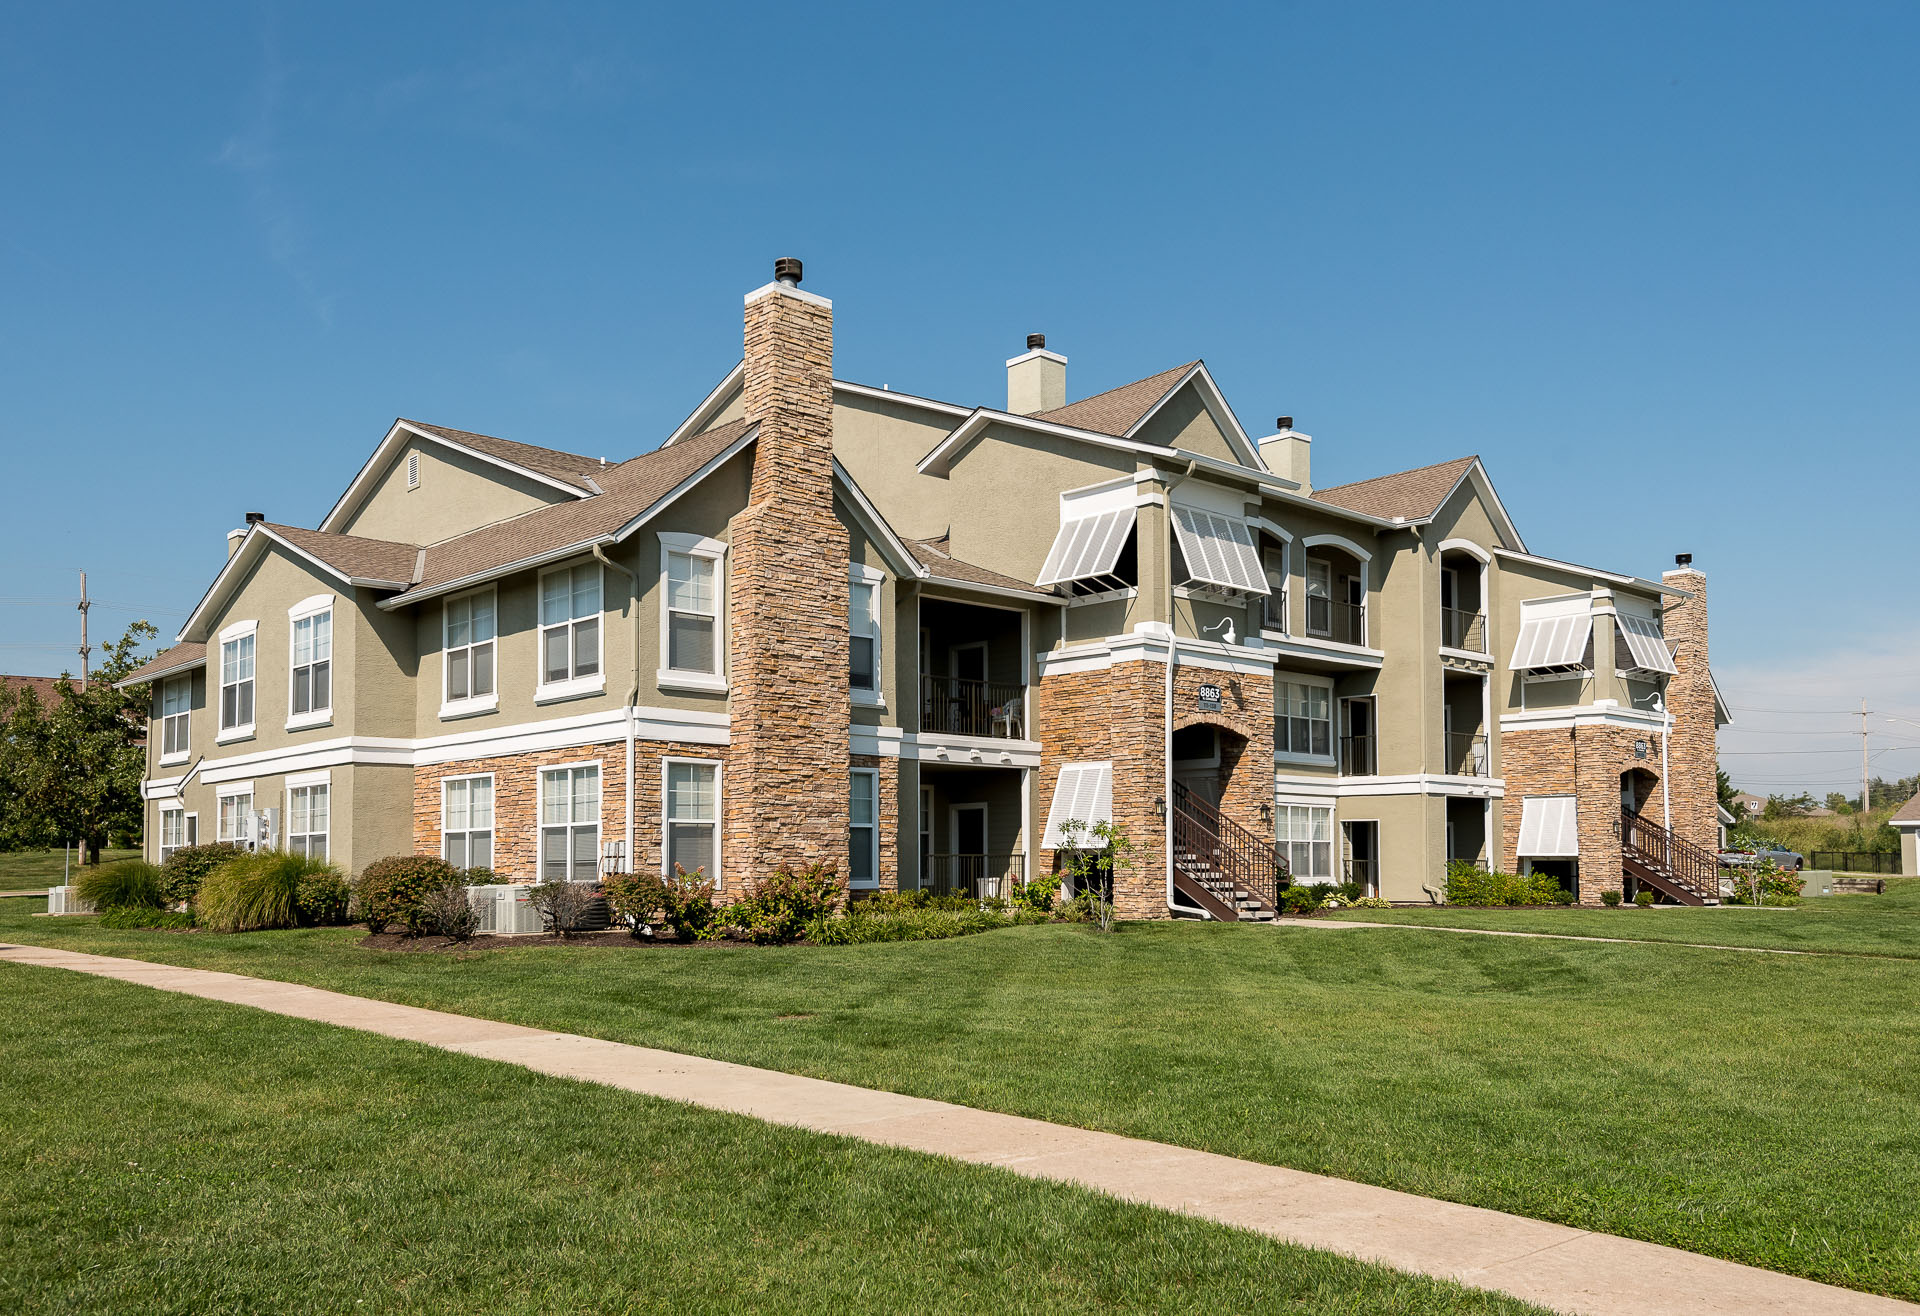 Sherpa Media Kansas City - Apartments & Multi-Family Housing - 30